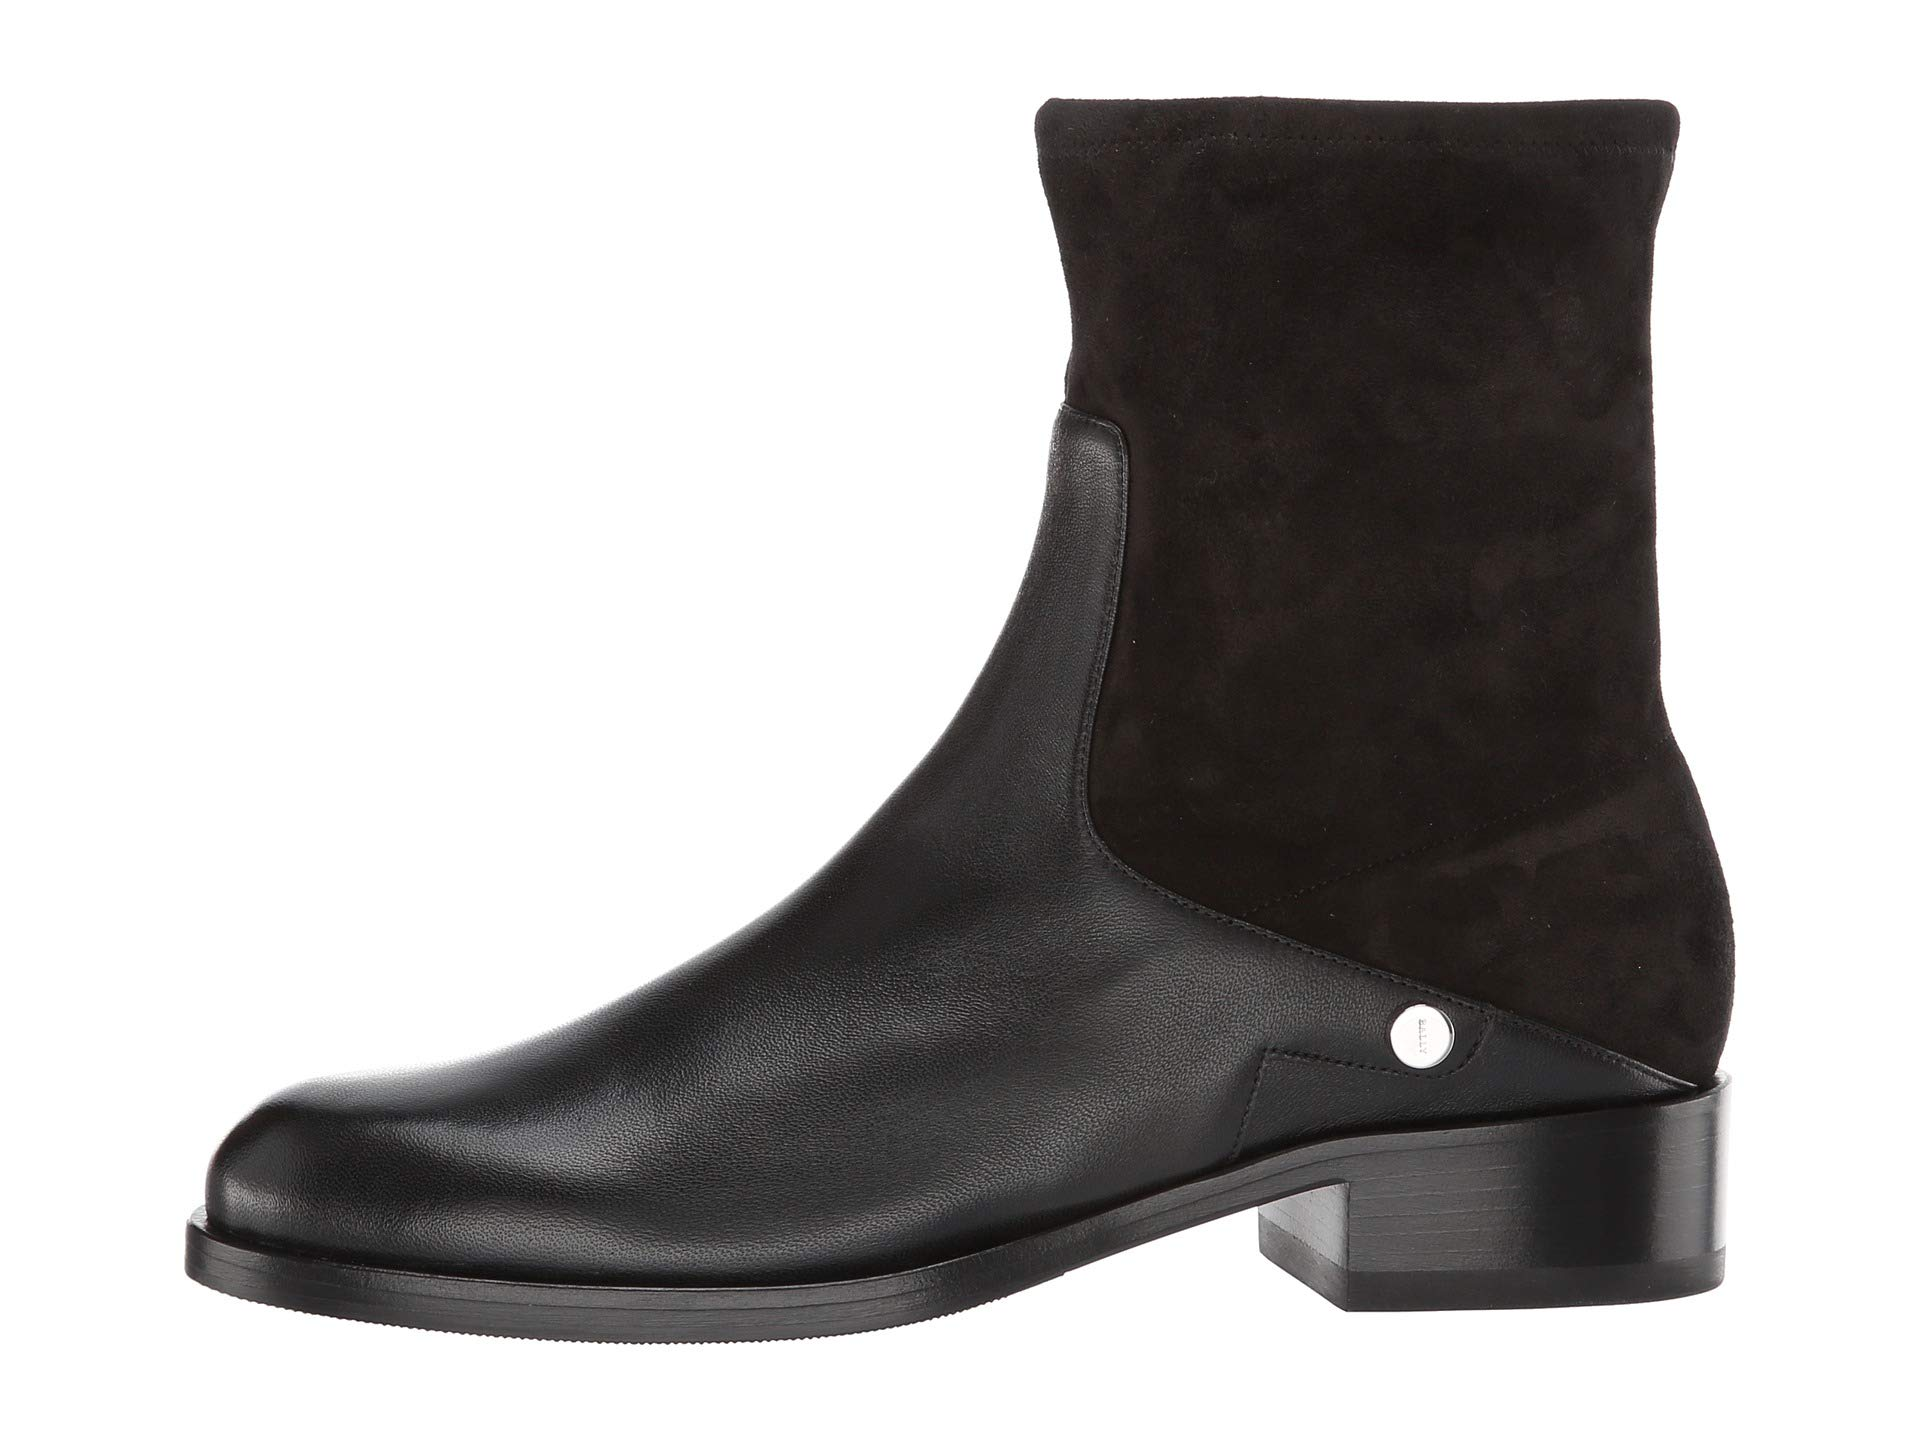 Boot Boot Bally Soana Soana Black Bally Black Pn7WSSwRq